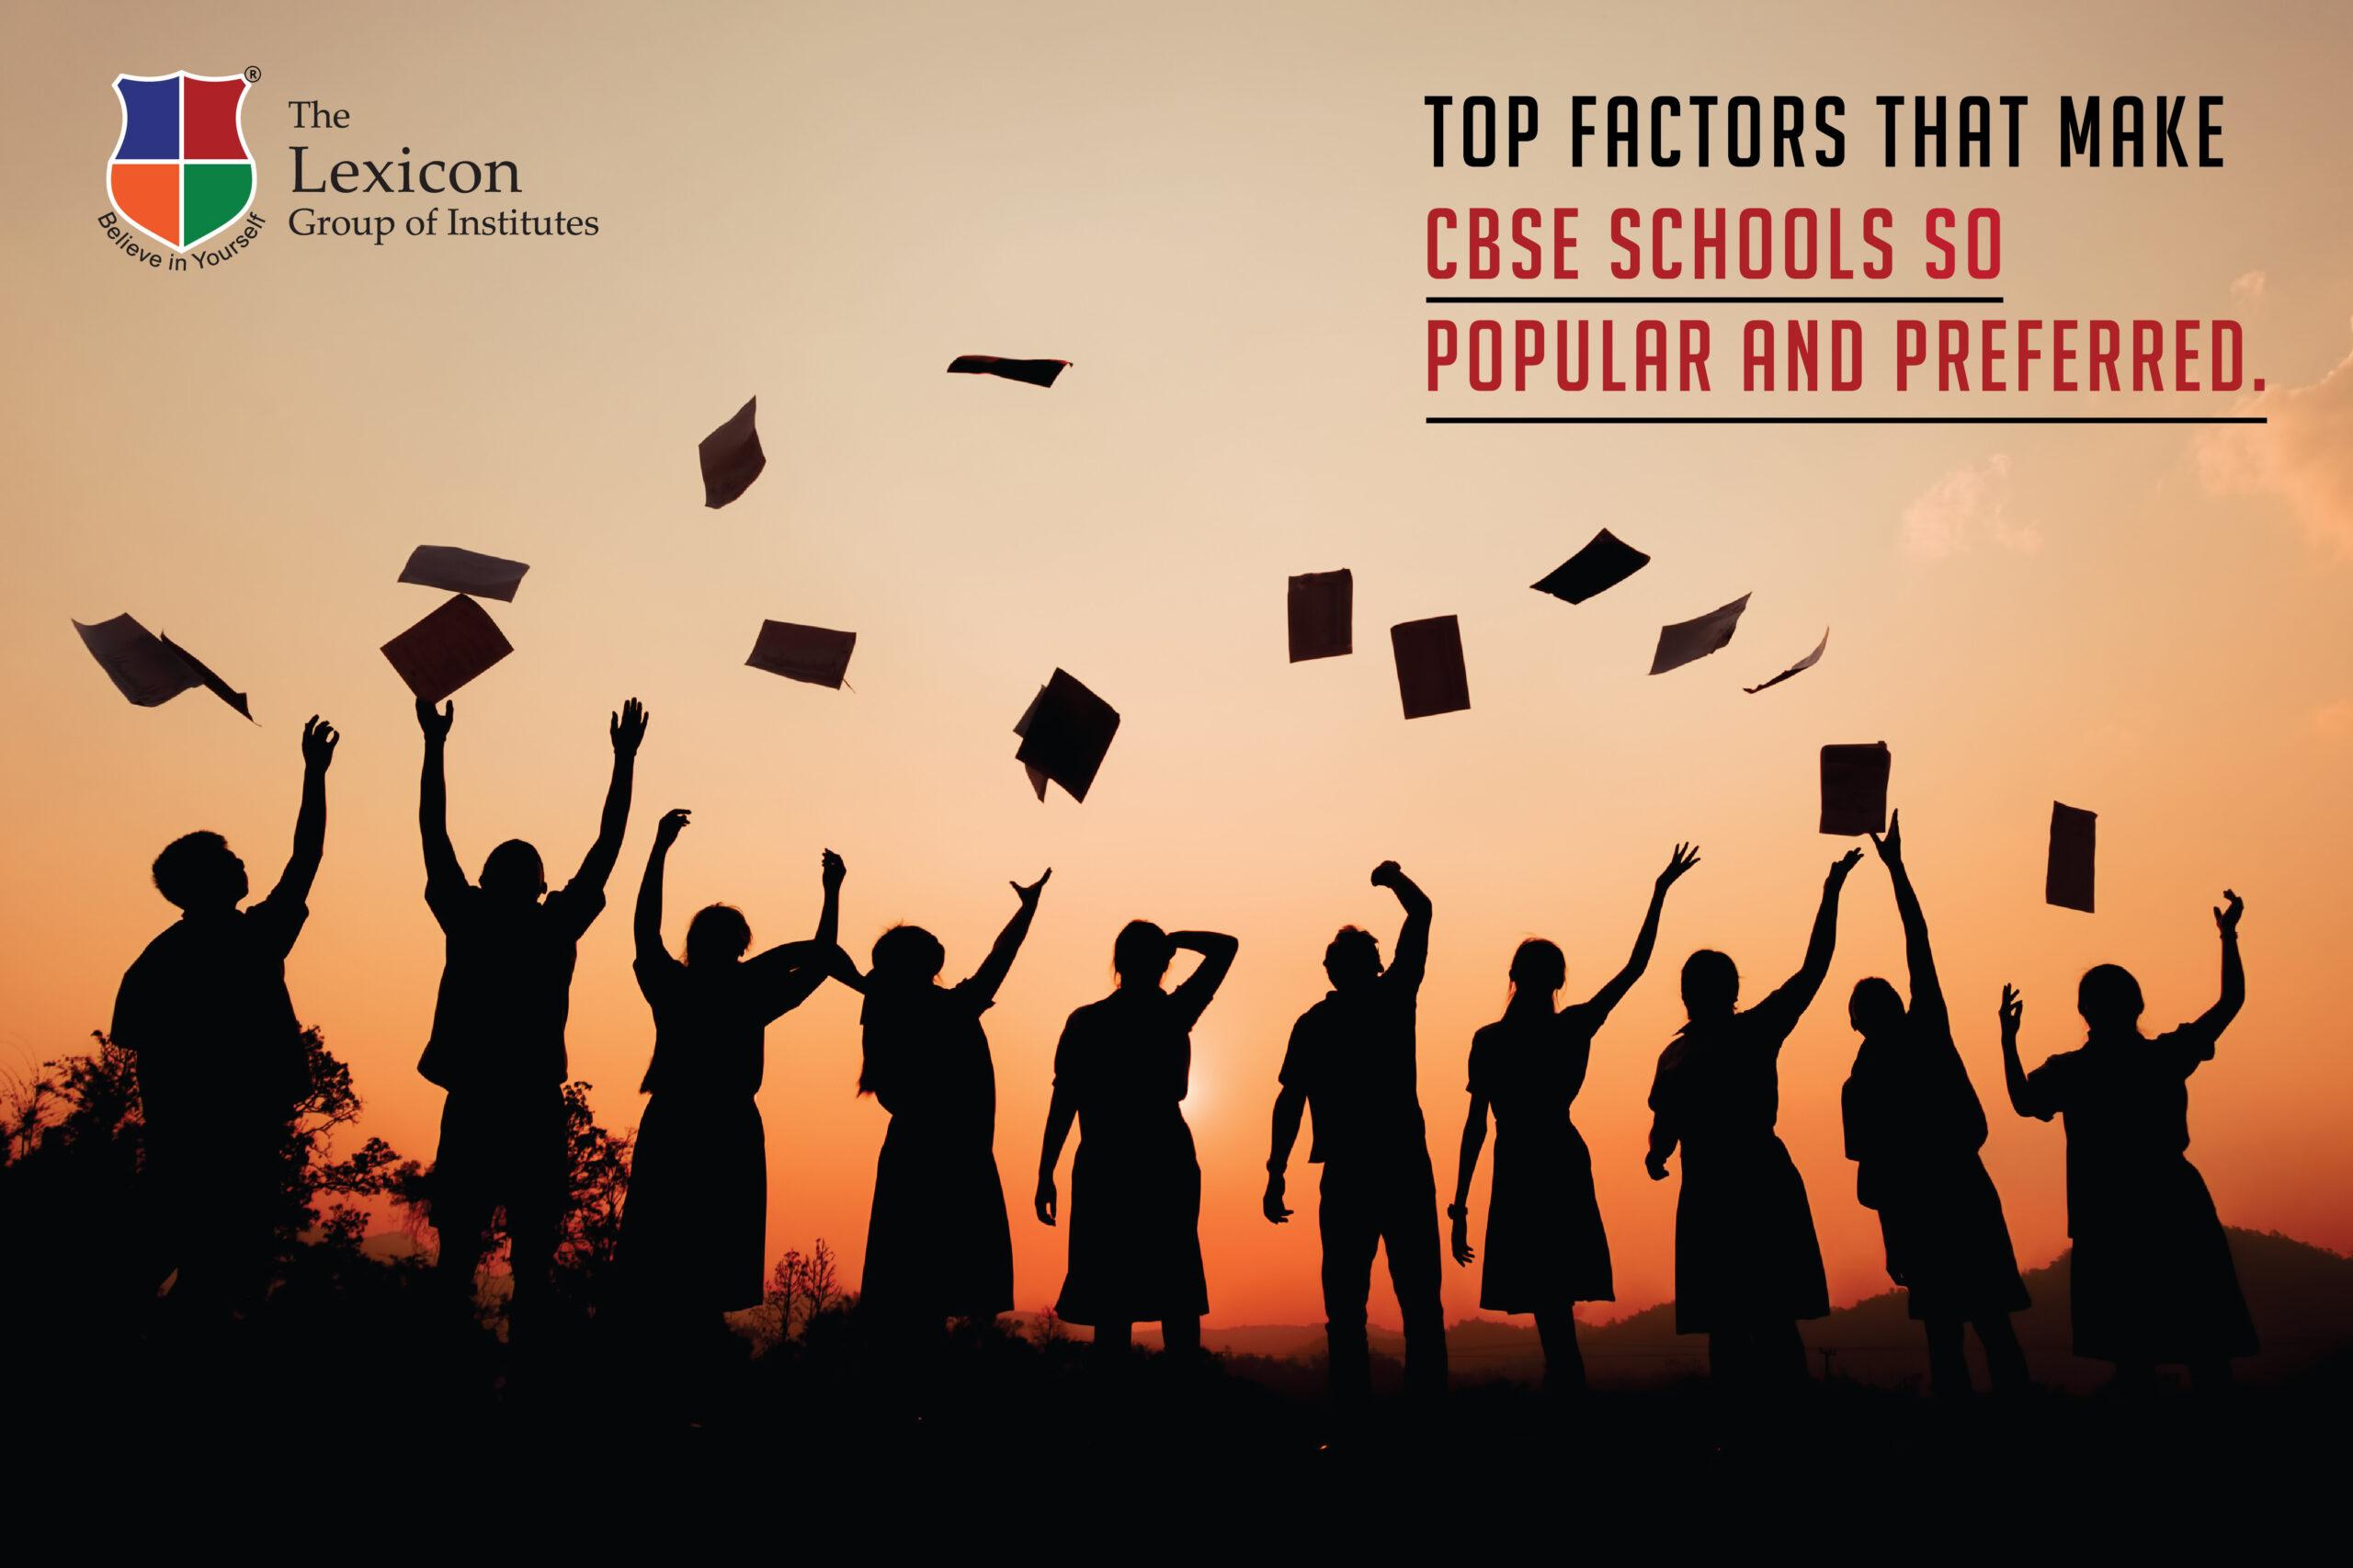 Top Factors That Make CBSE Schools So Popular And Preferred